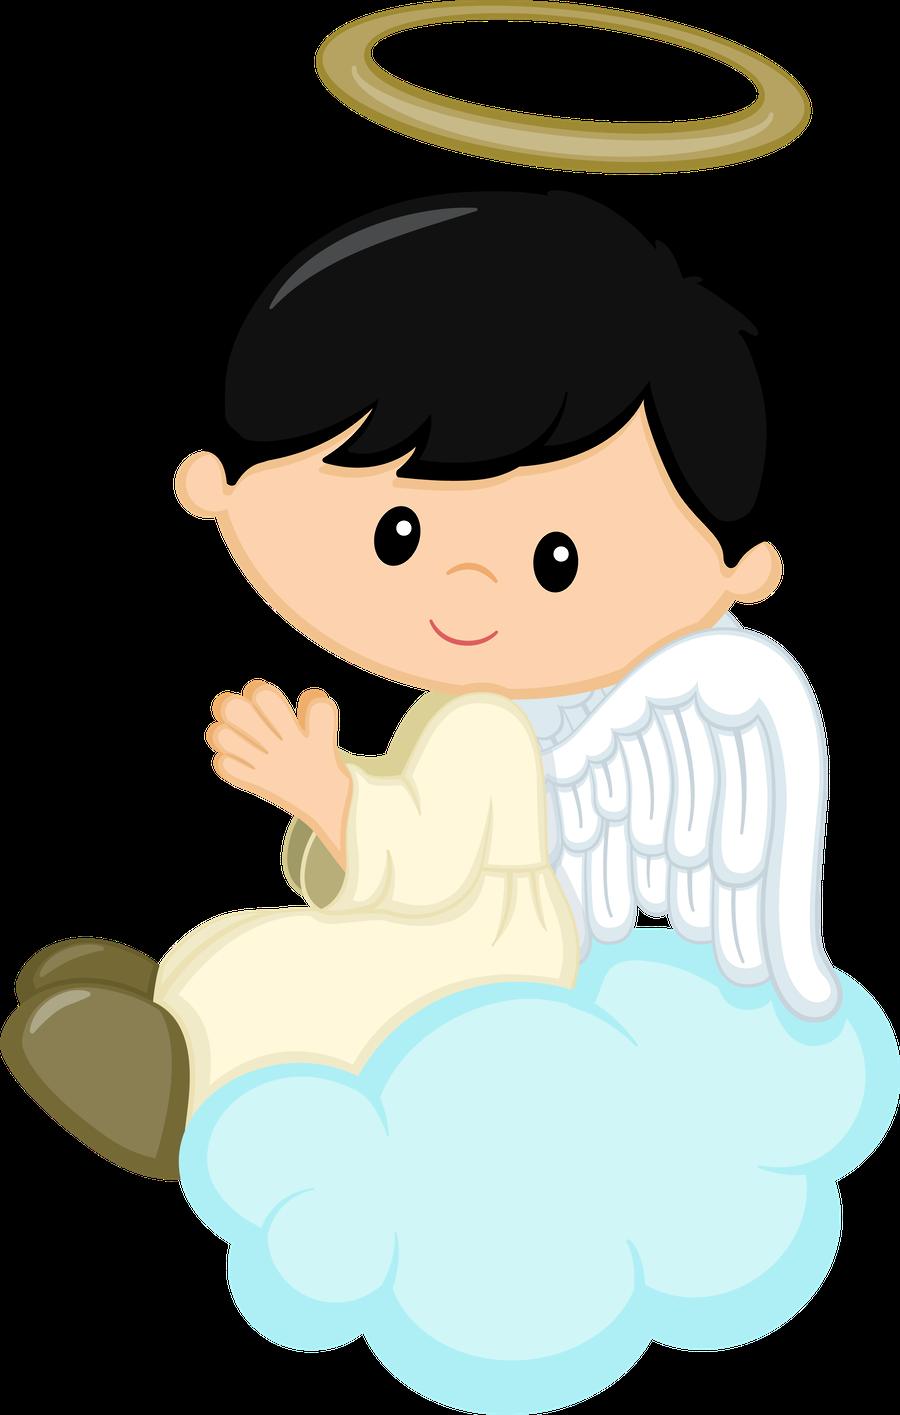 Christmas Angel Clipart.Angel Vector Angel Clipart Communion Clip Art Christmas